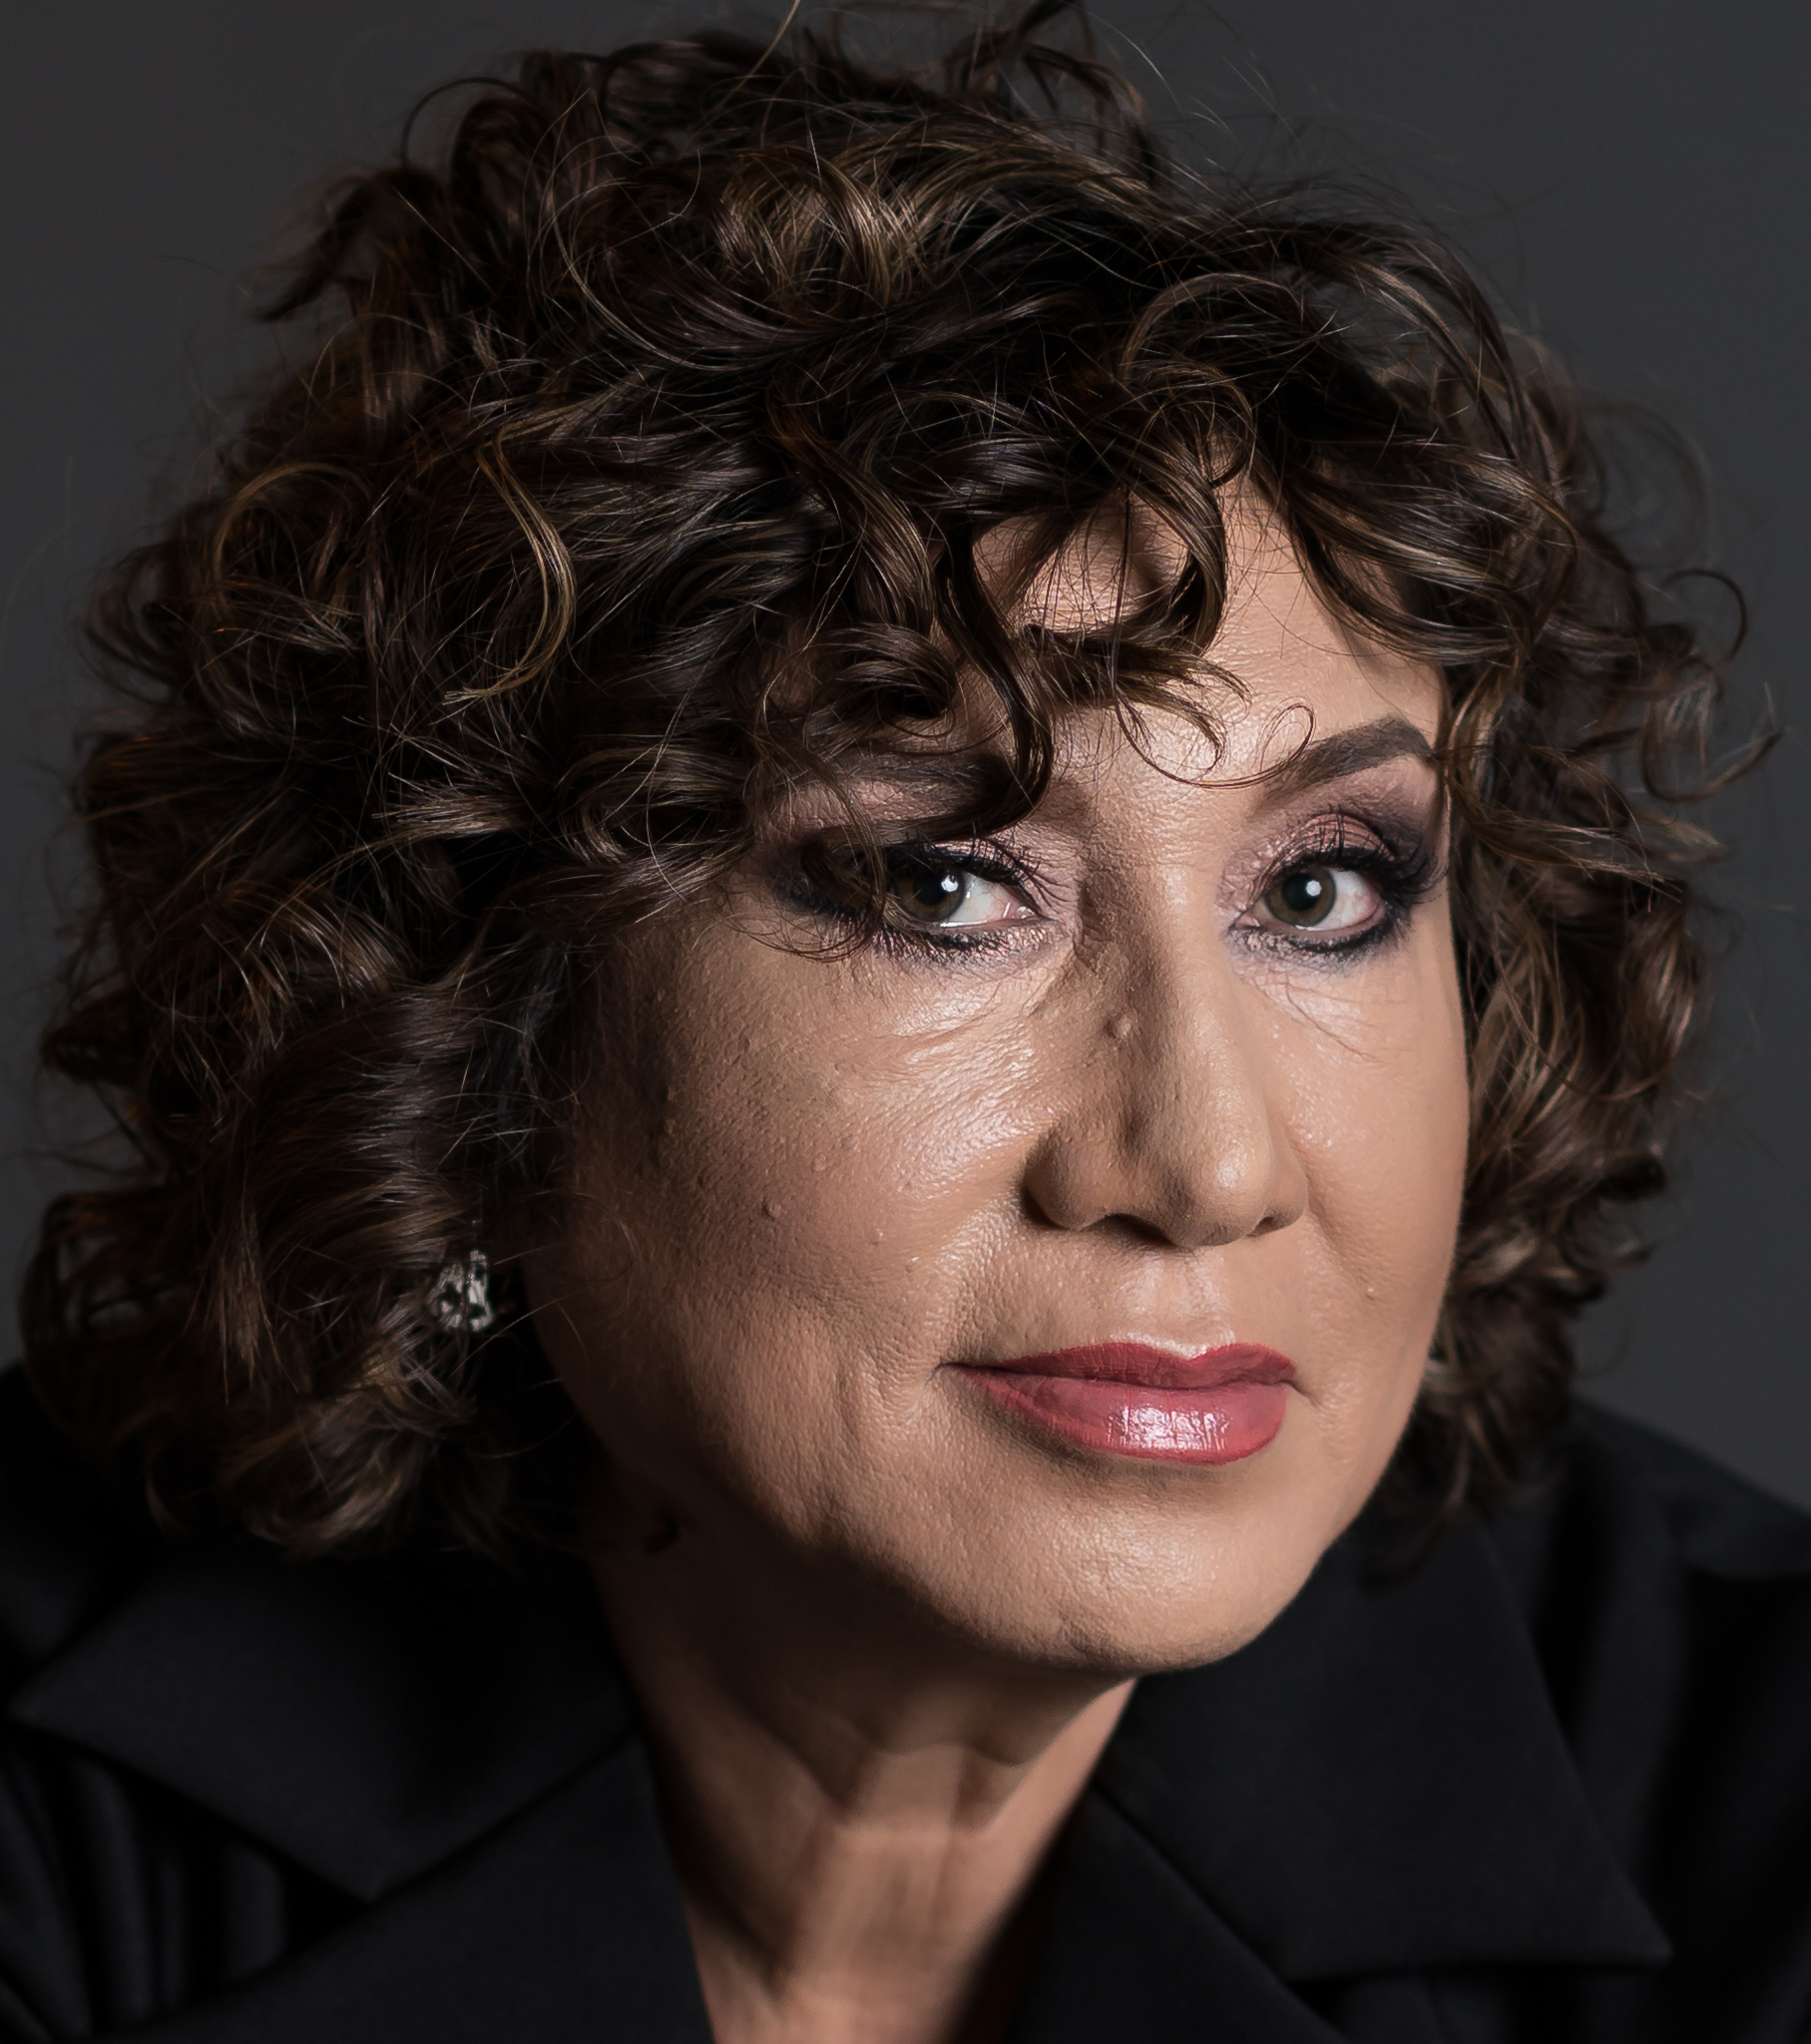 Dra. Silvia Cabrera Carpio